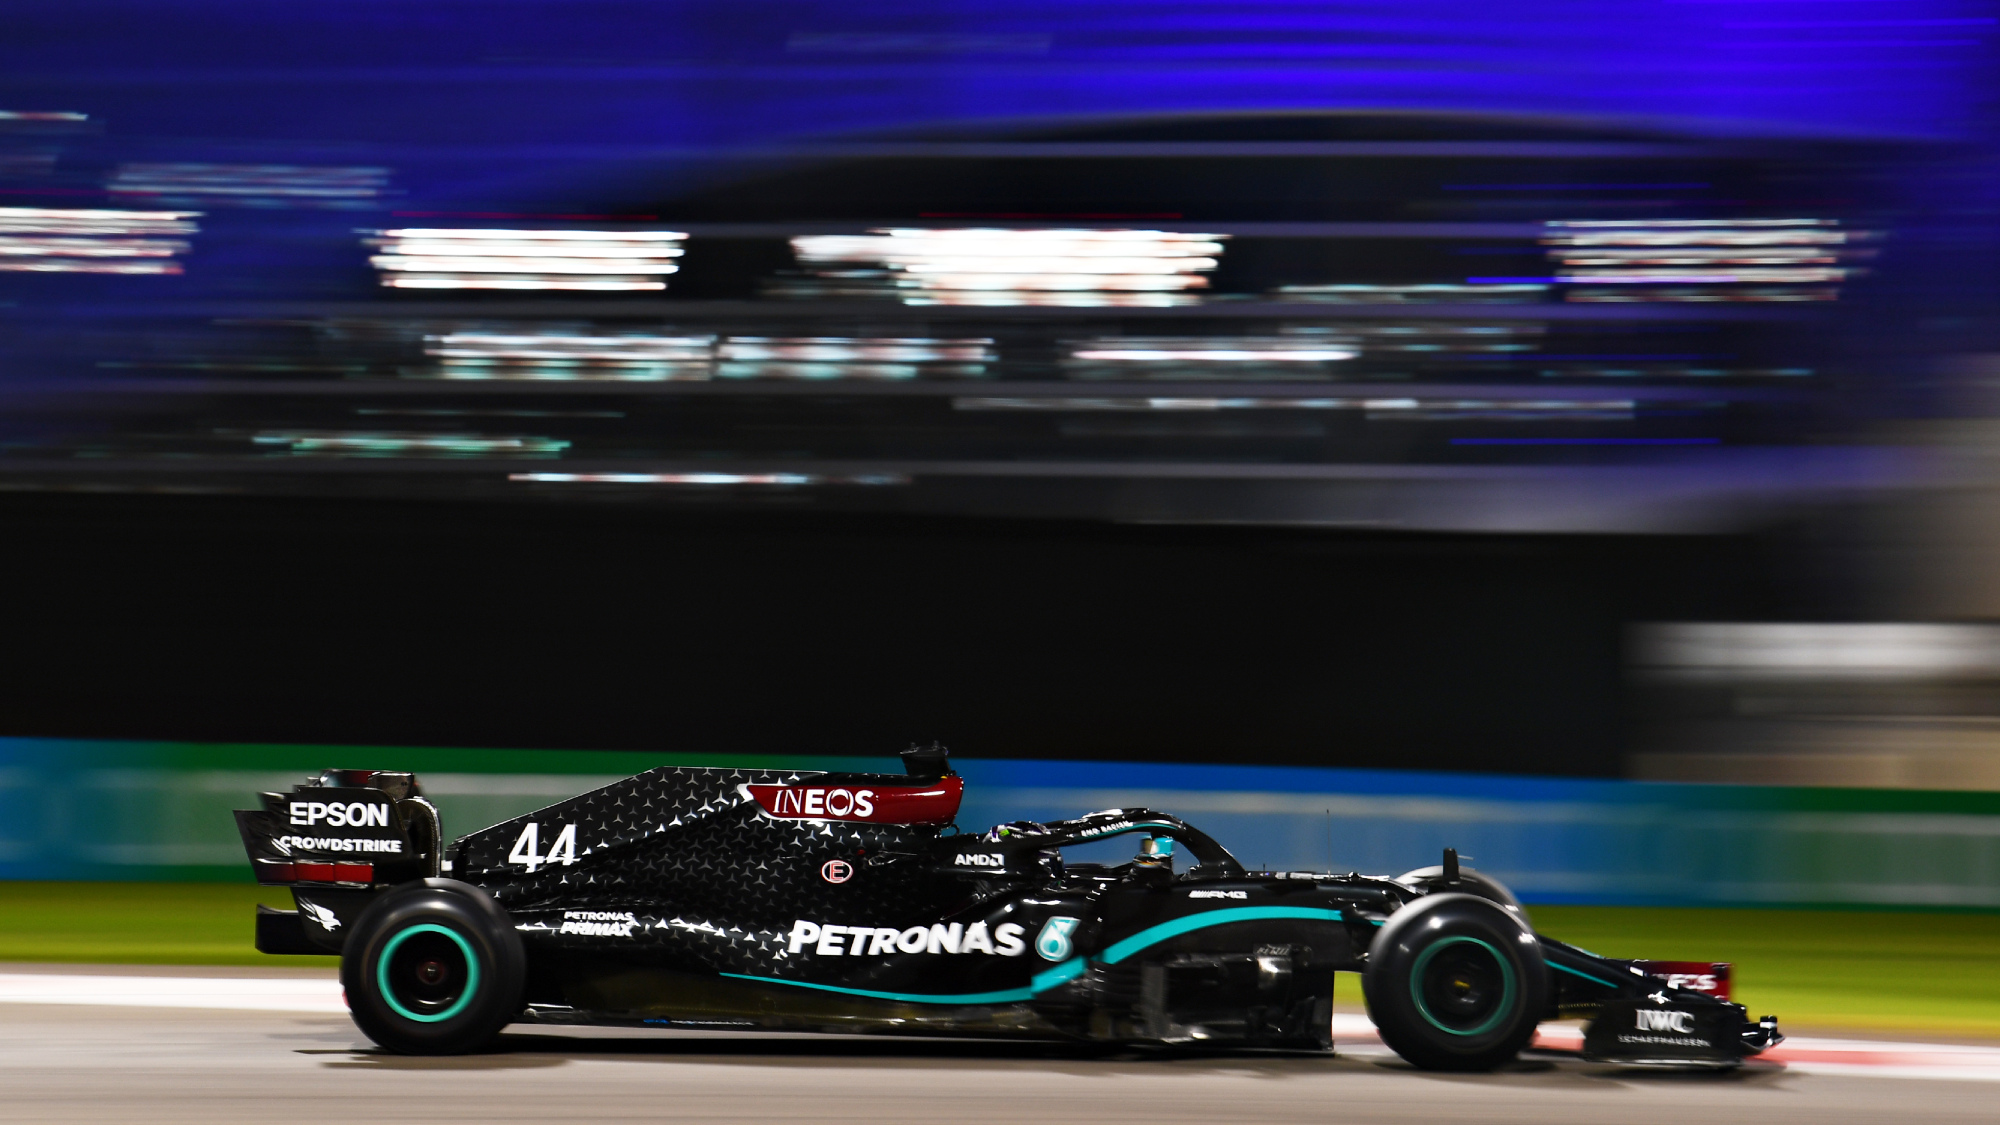 Lewis Hamilton, 2020 Abu Dhabi Grand Prix